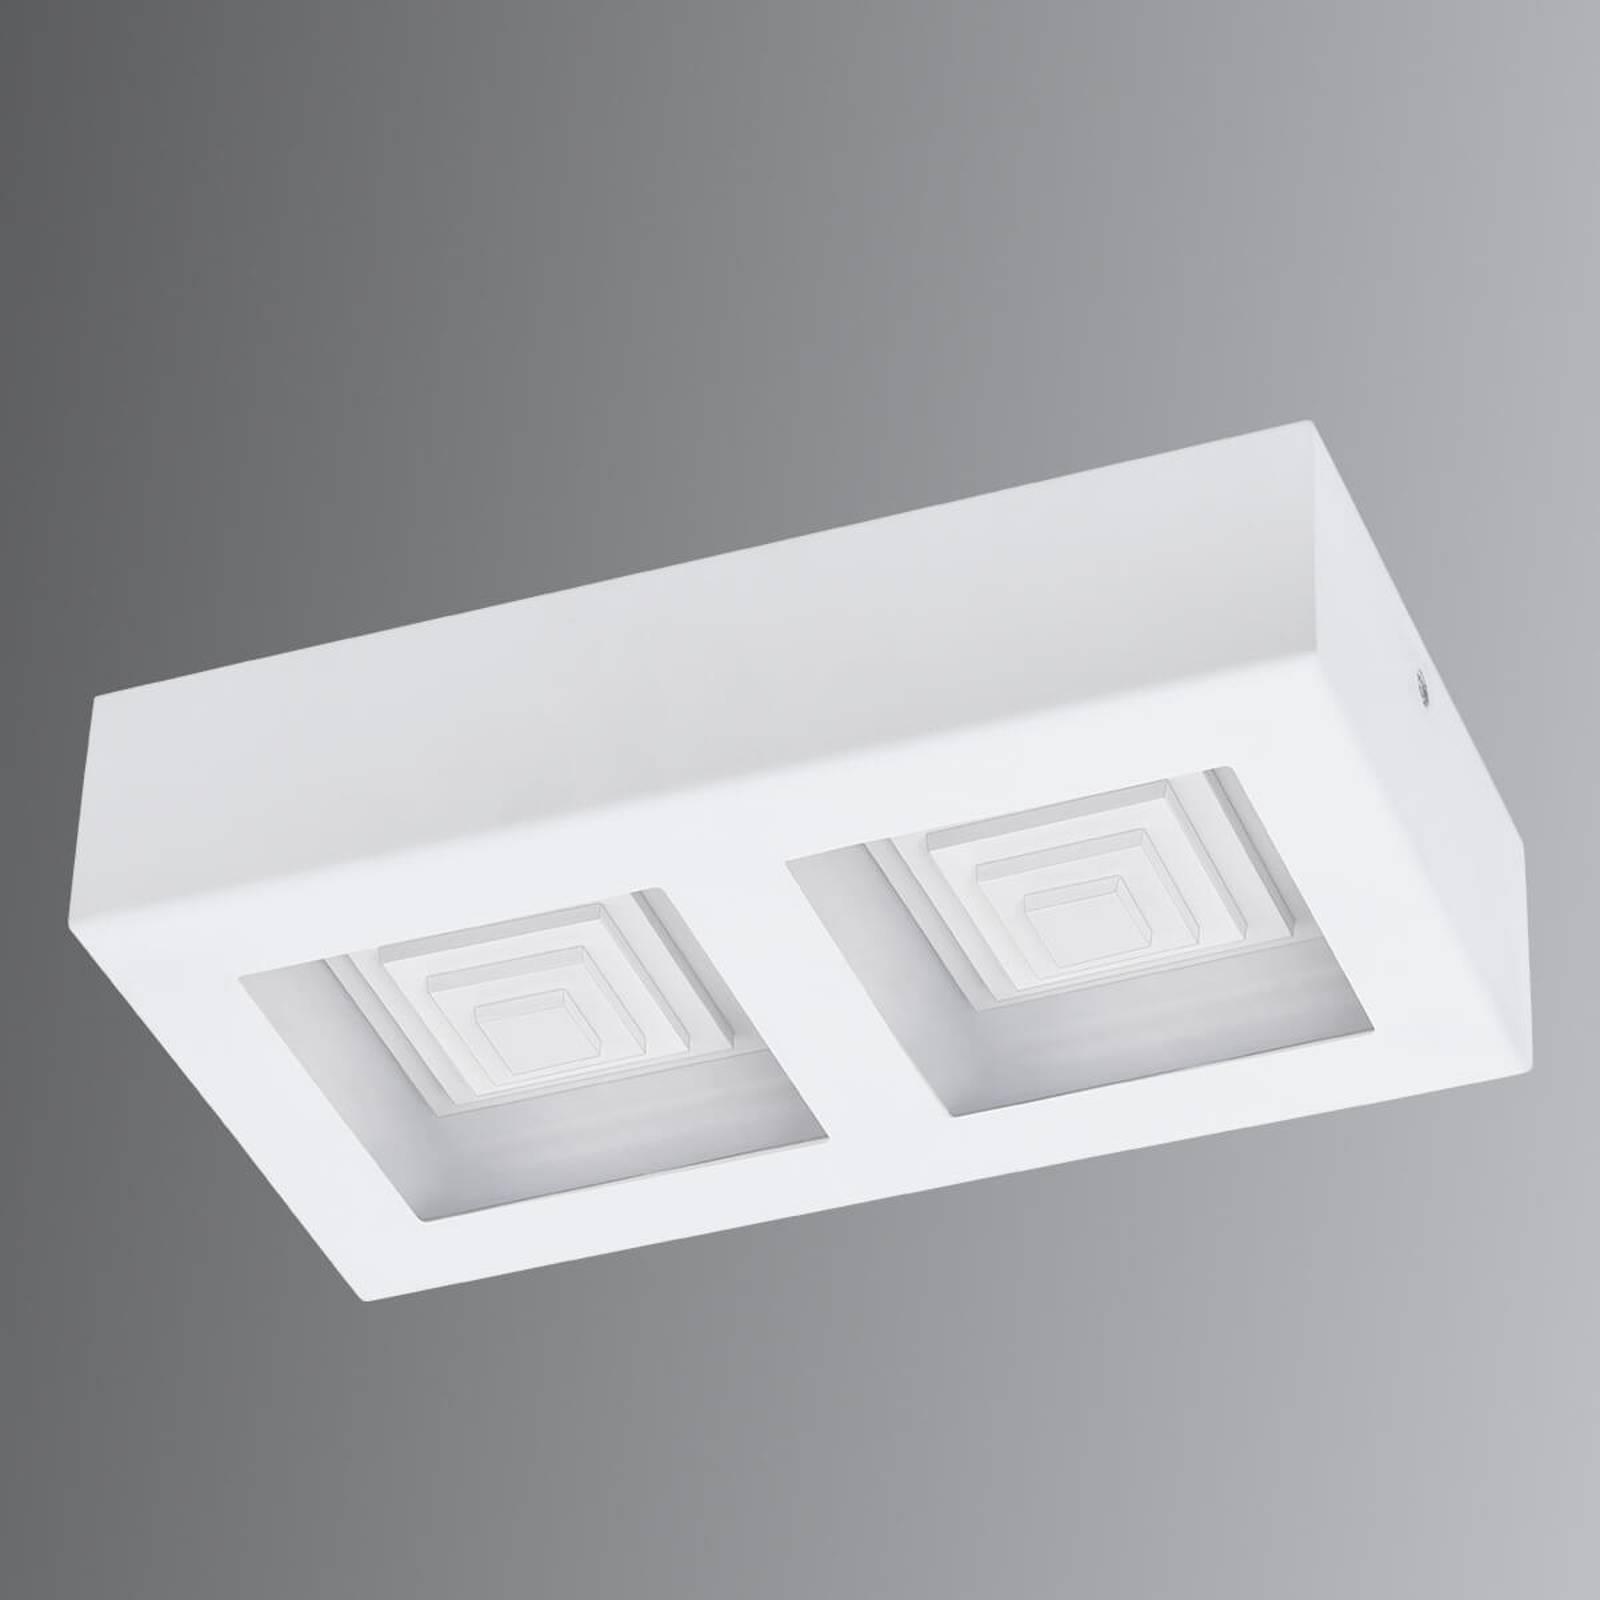 Ferreros - 2-lamps LED plafondlamp in wit